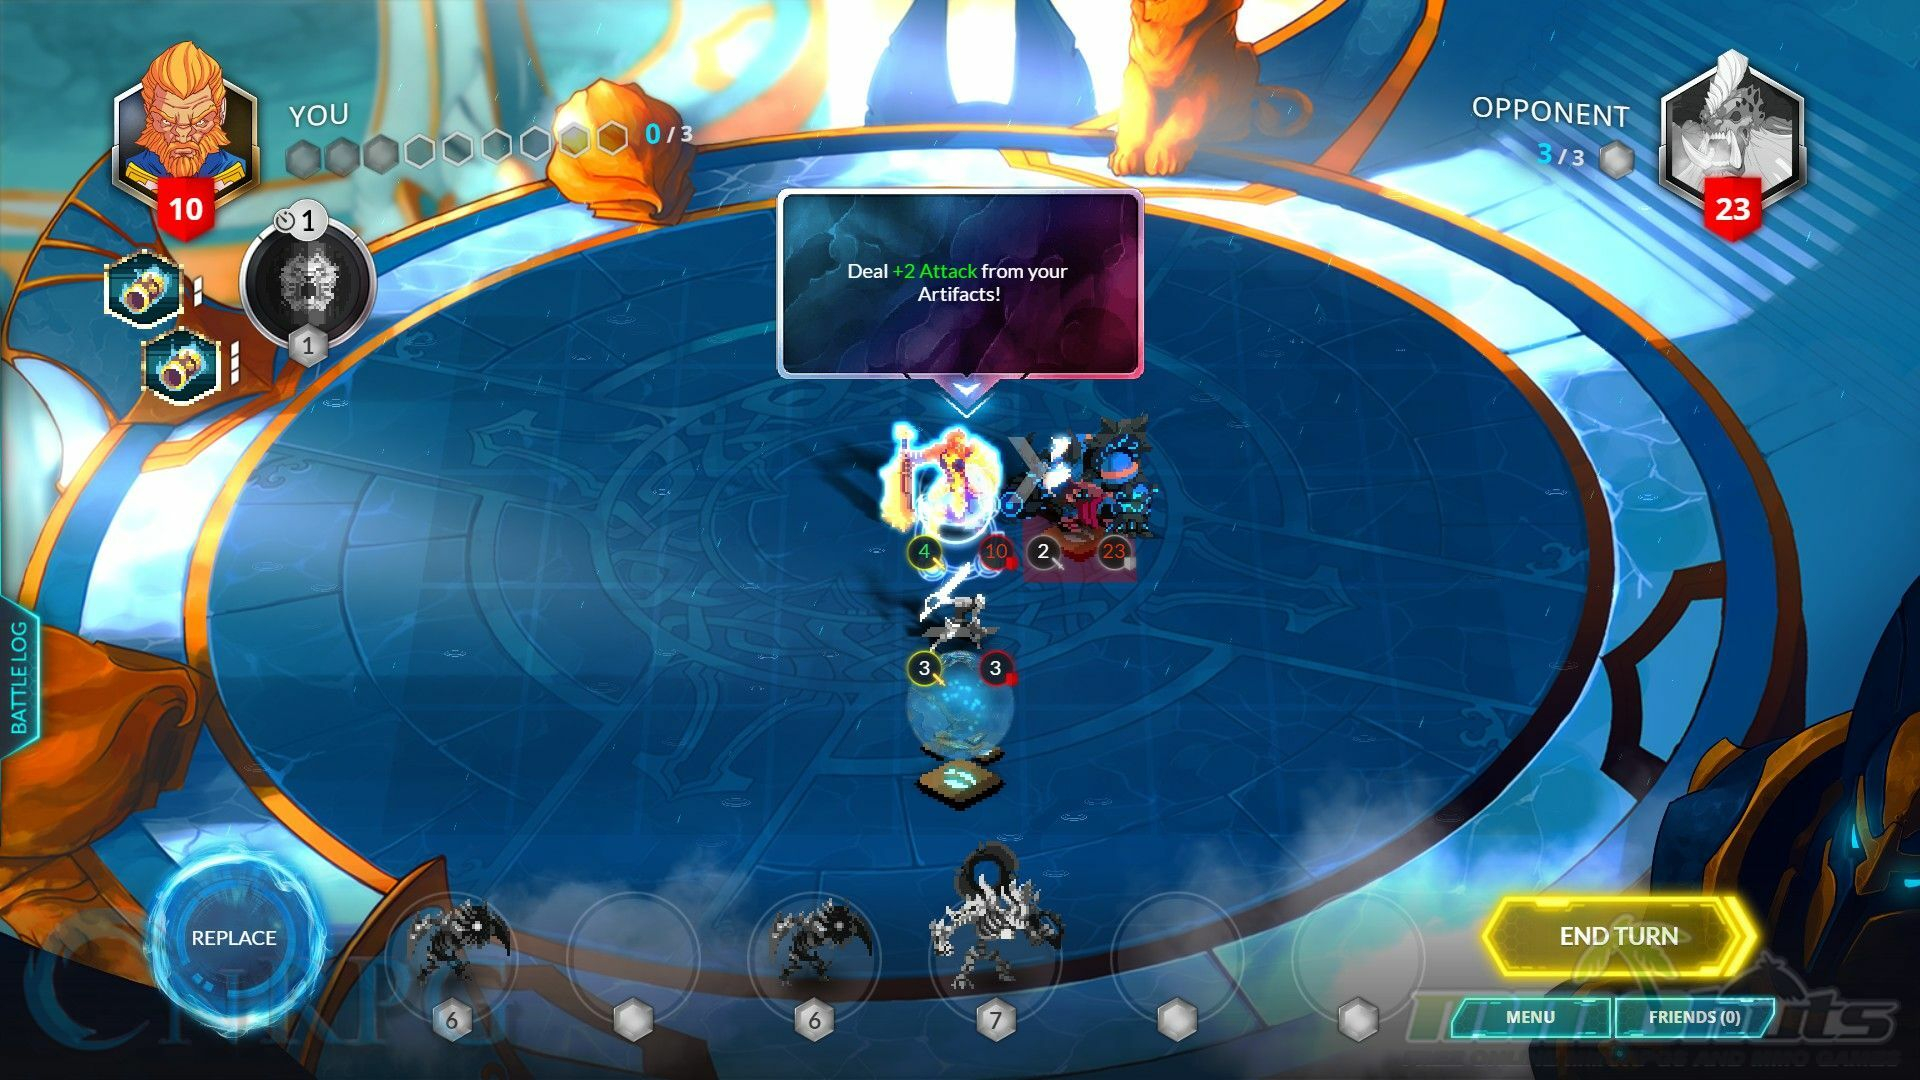 Duelyst Review - Board Game Tactics Meets CCG Goodness